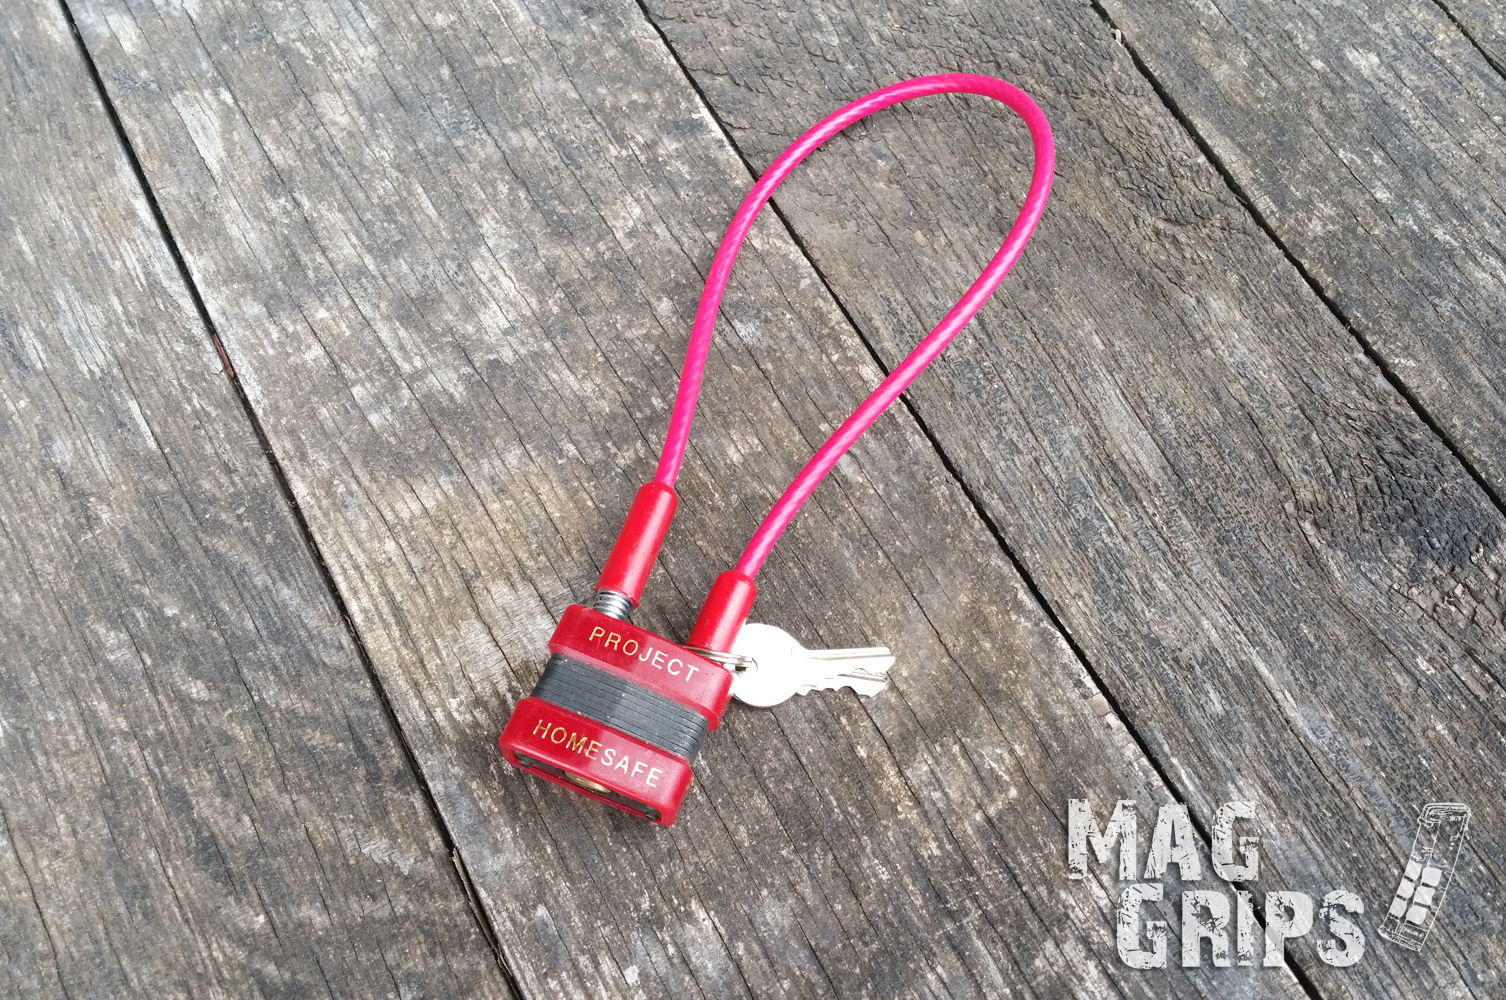 Project Homesafe - Gun Cable Lock